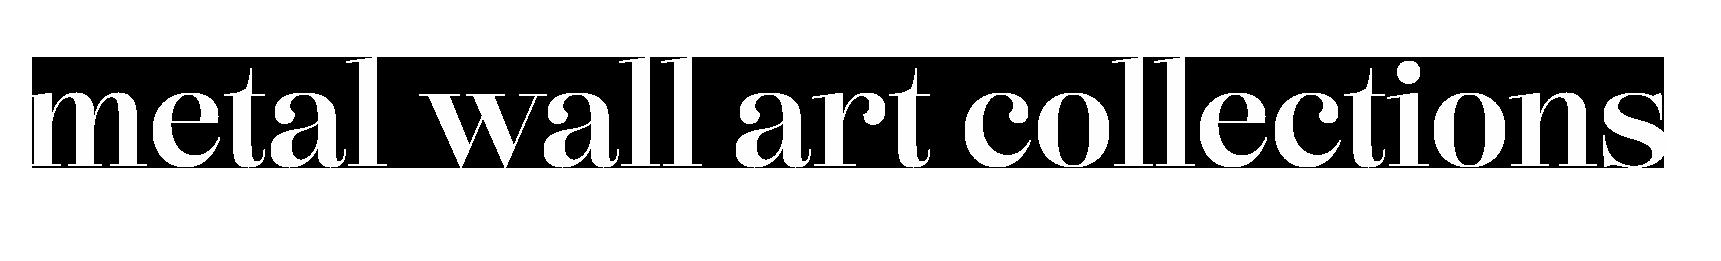 metal wall art.png